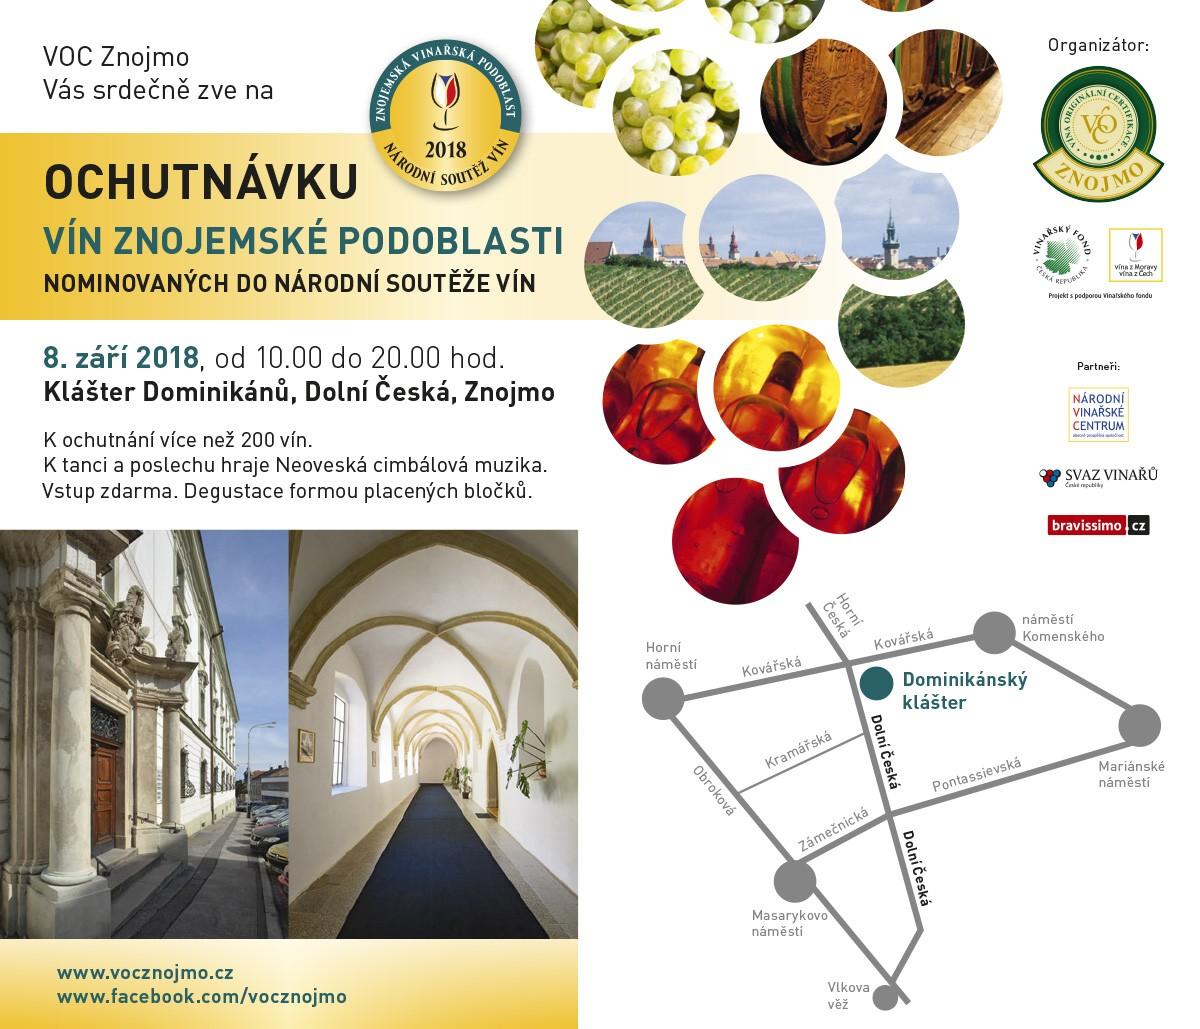 Ochutnávka vín Znojemské podoblasti 8. 9. 2018